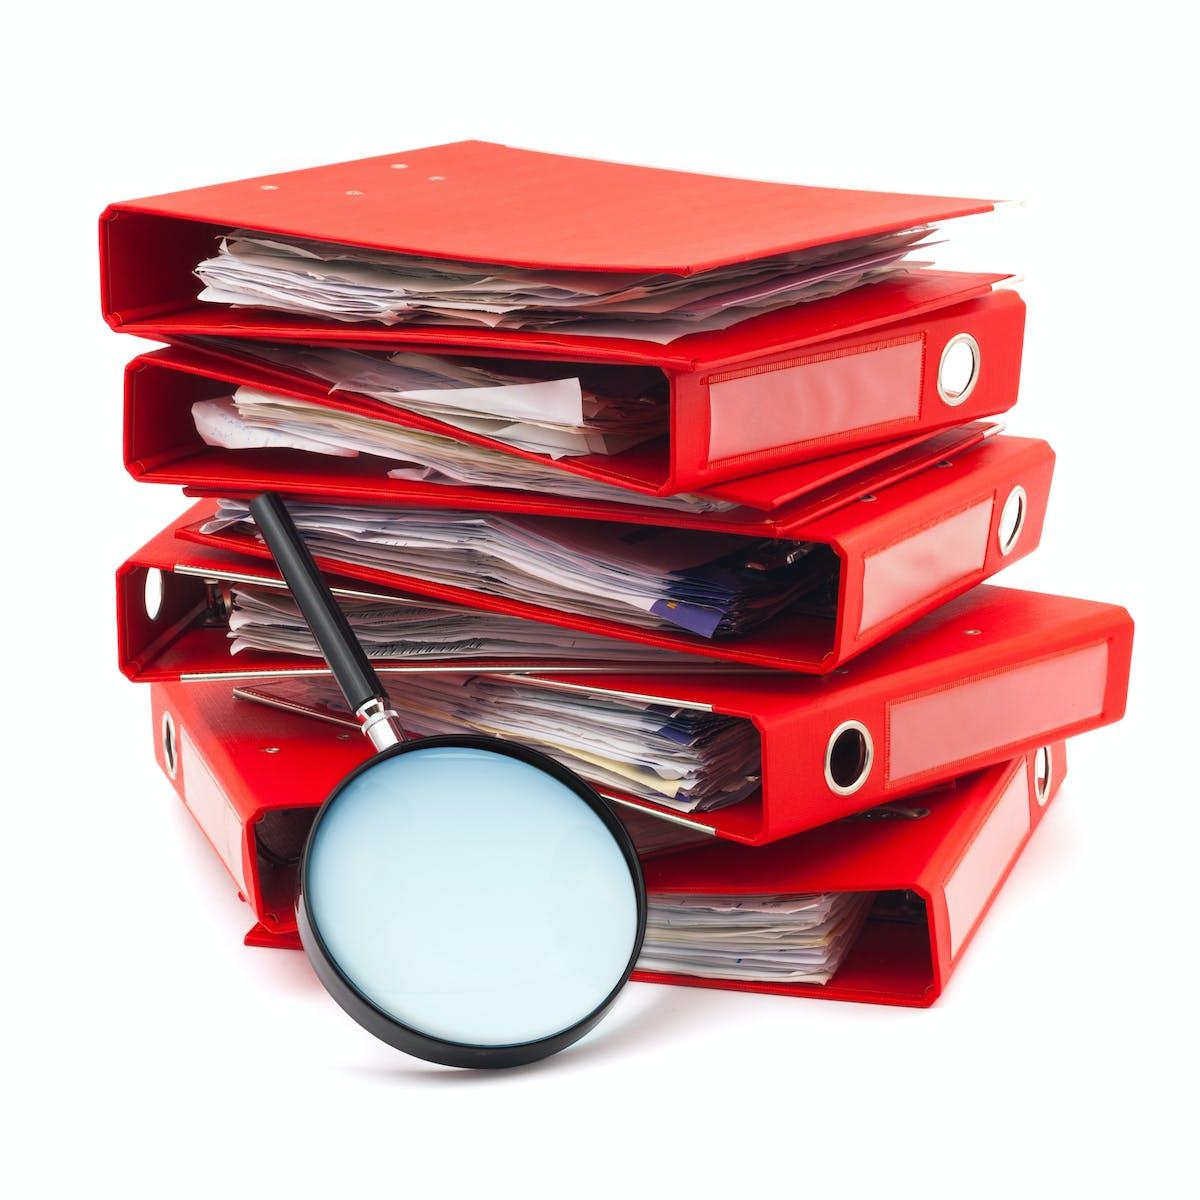 Examining documents